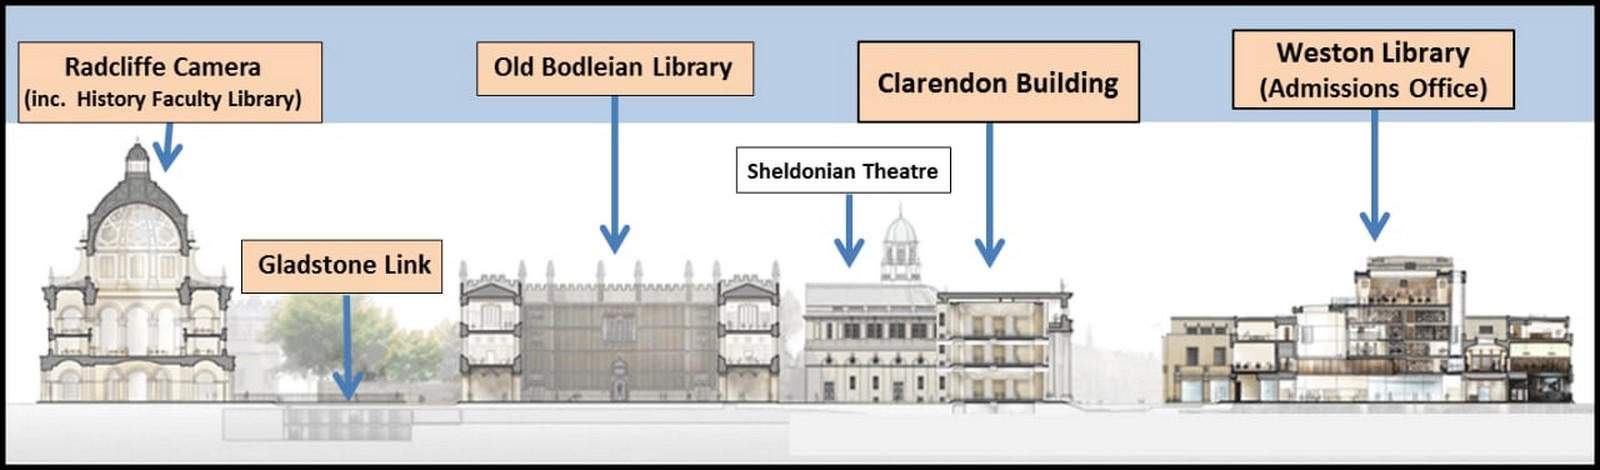 Bodleian Library, Oxford - Sheet1